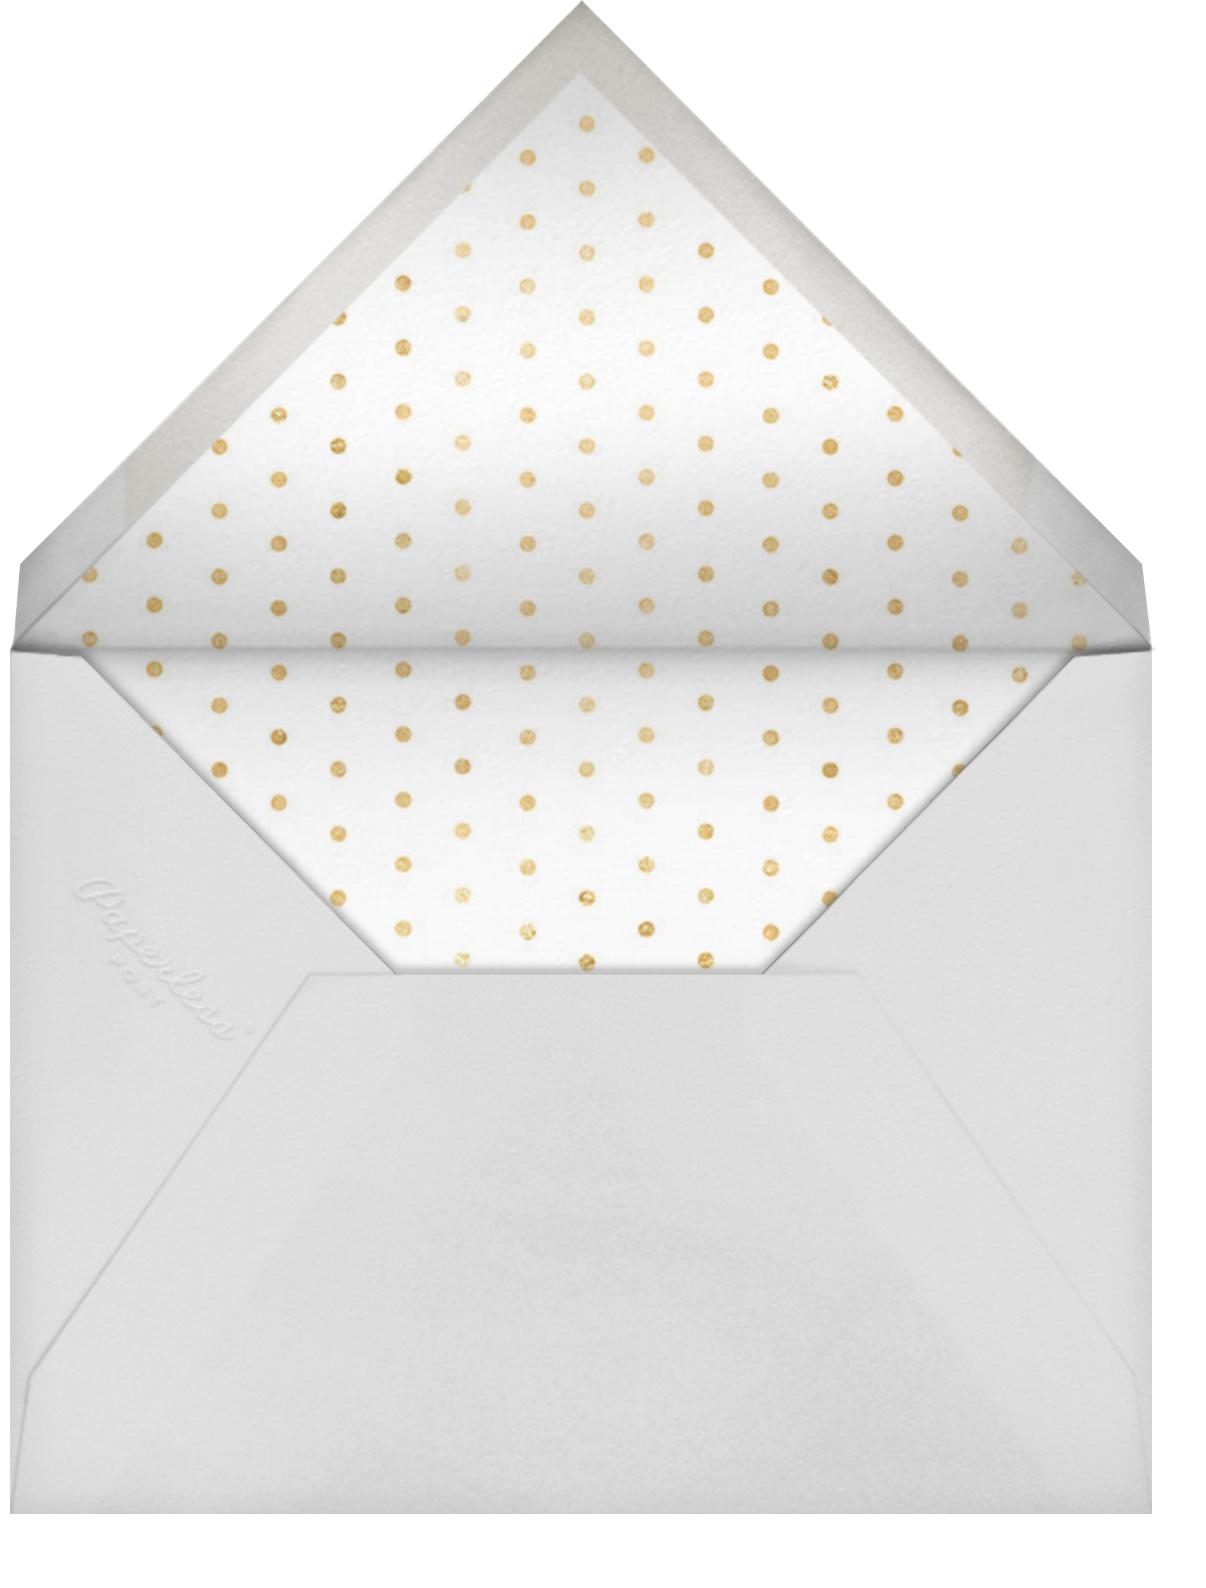 Candle Corner - kate spade new york - Kids' birthday - envelope back